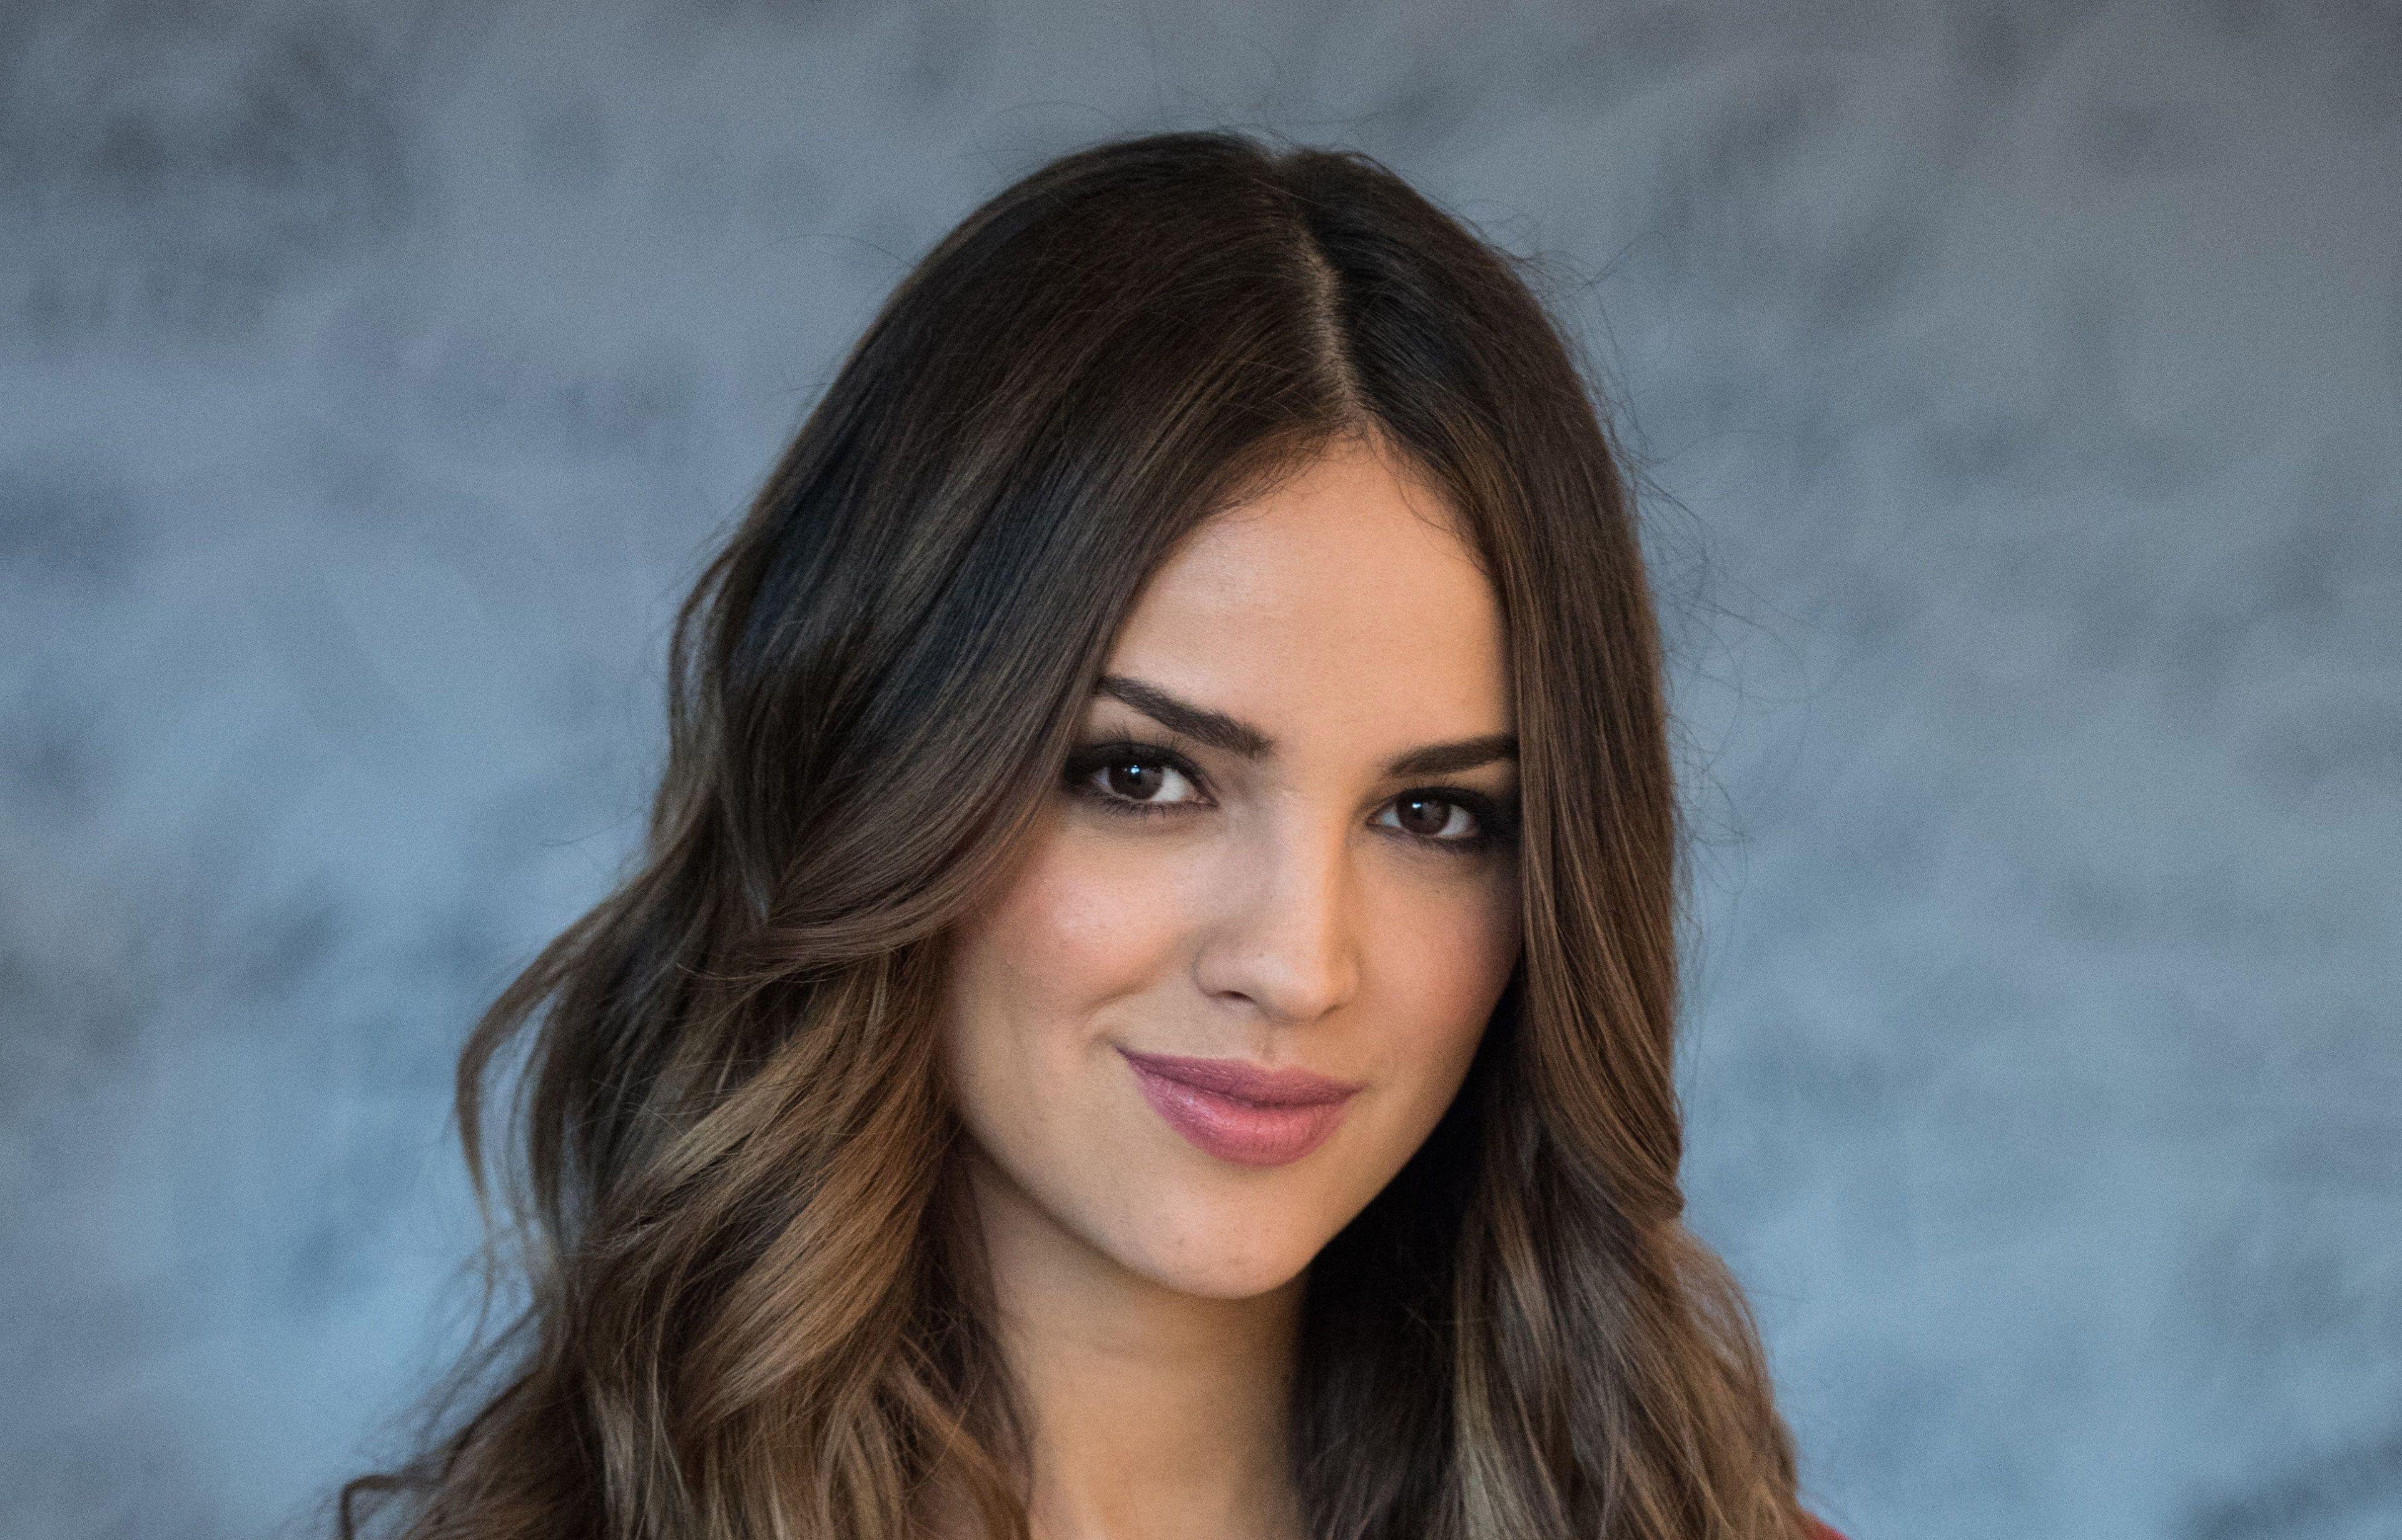 3840x2462 Eiza Gonzalez 4k Free Download Hd Wallpaper Eiza Gonzalez Mexican Actress Beauty